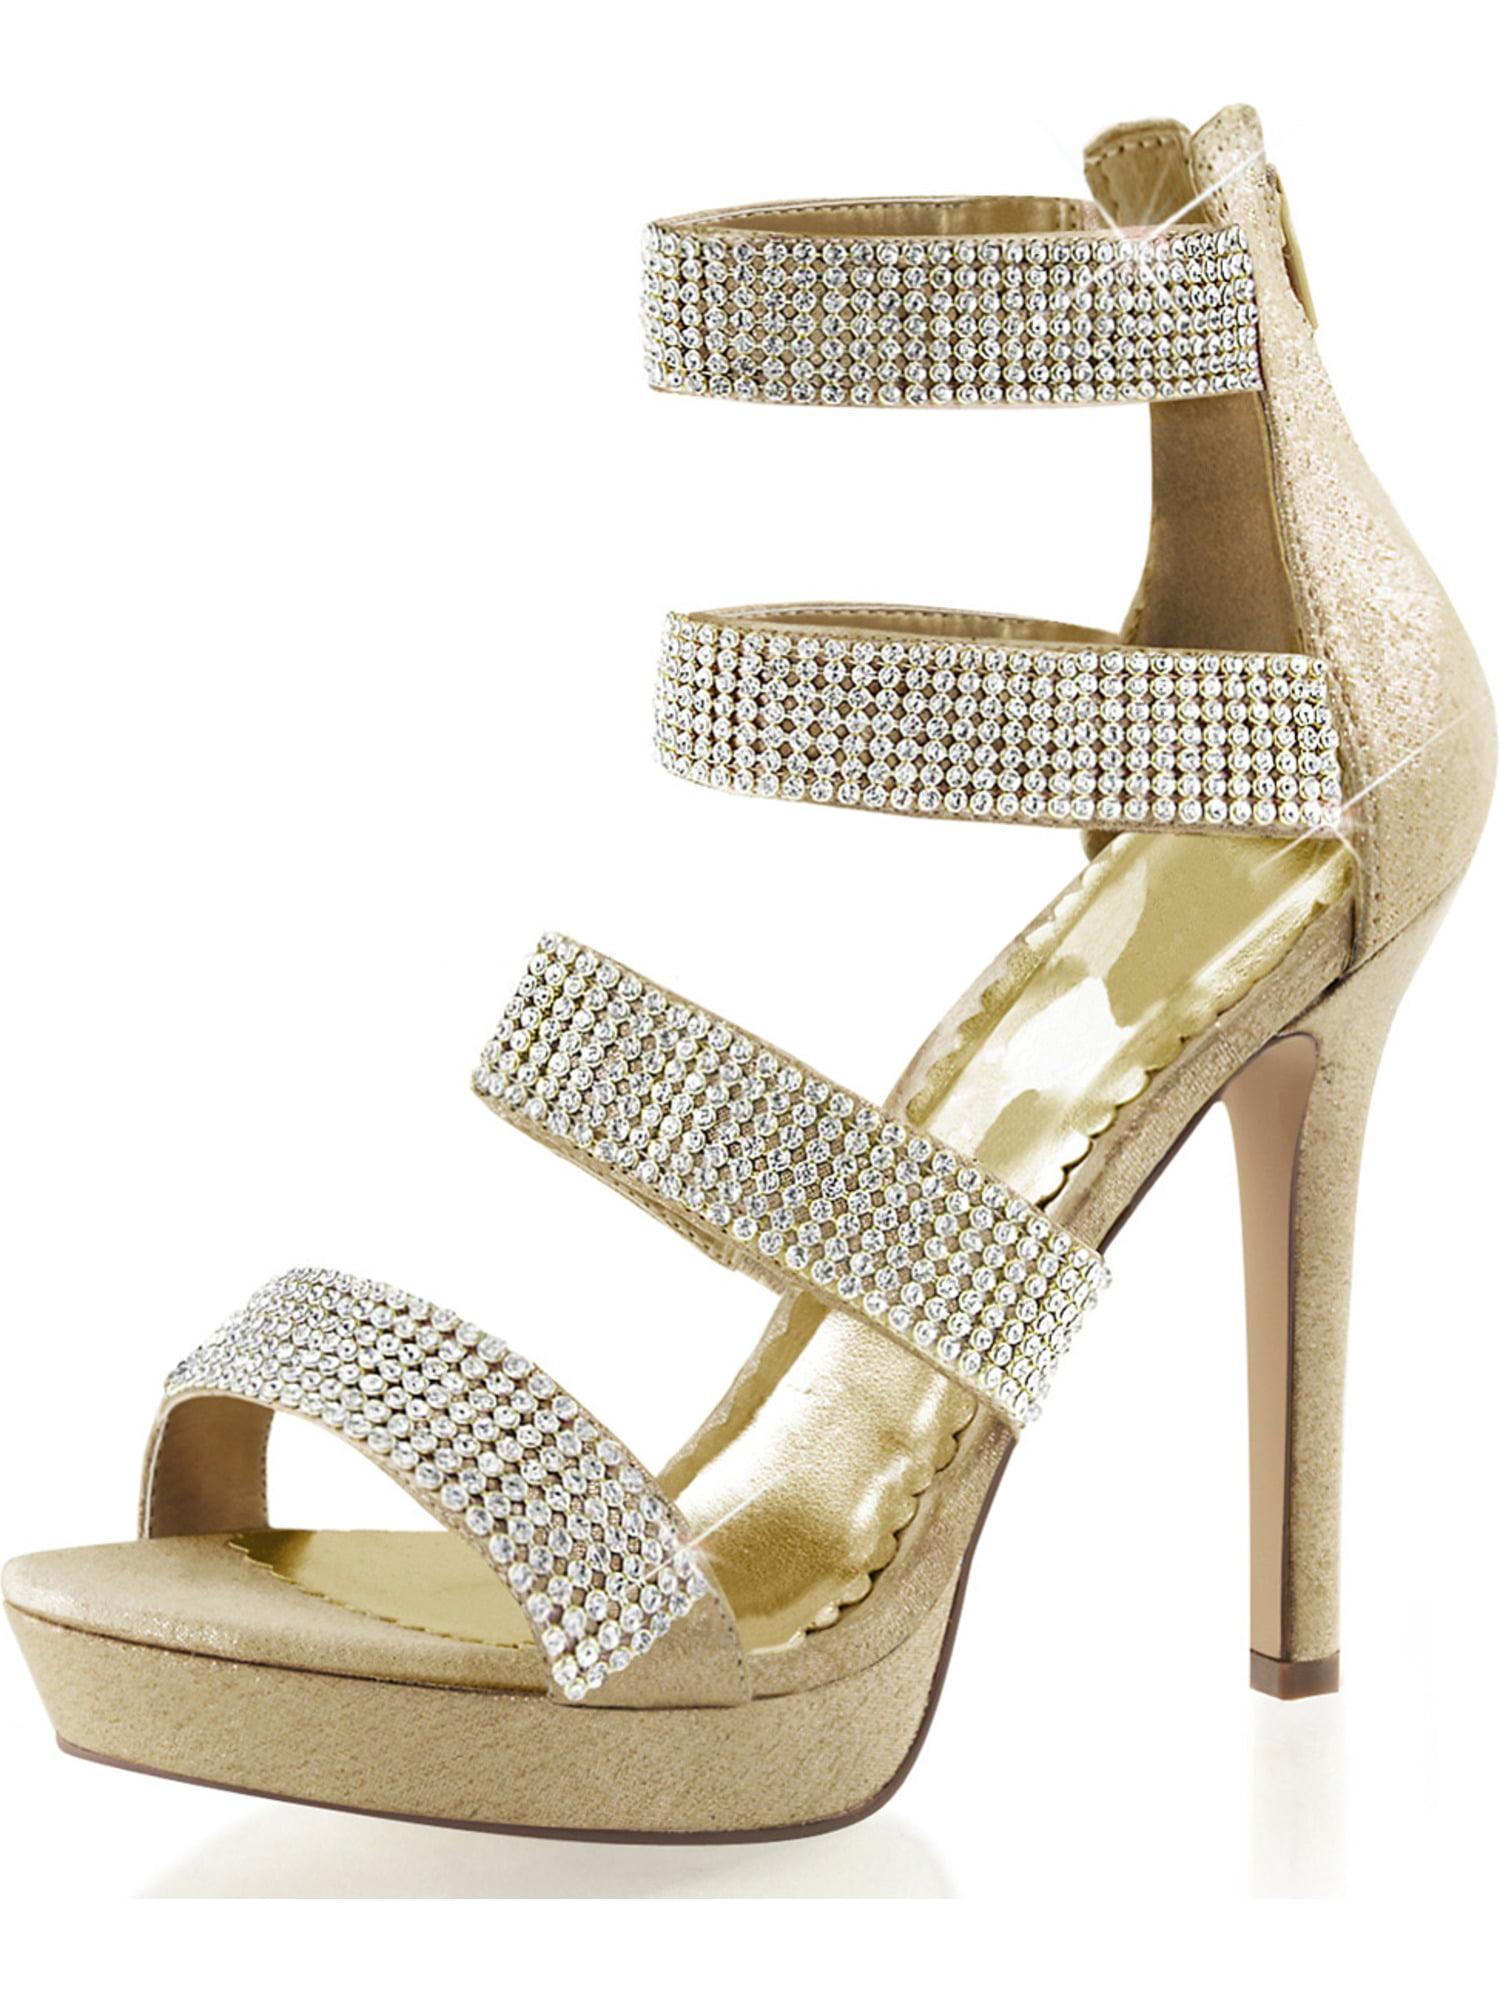 fe489428bb8 SummitFashions - Womens Gold Strappy Heels Platform Sandals Rhinestones  Shoes 4 3 4 Inch Heels Size  5 - Walmart.com